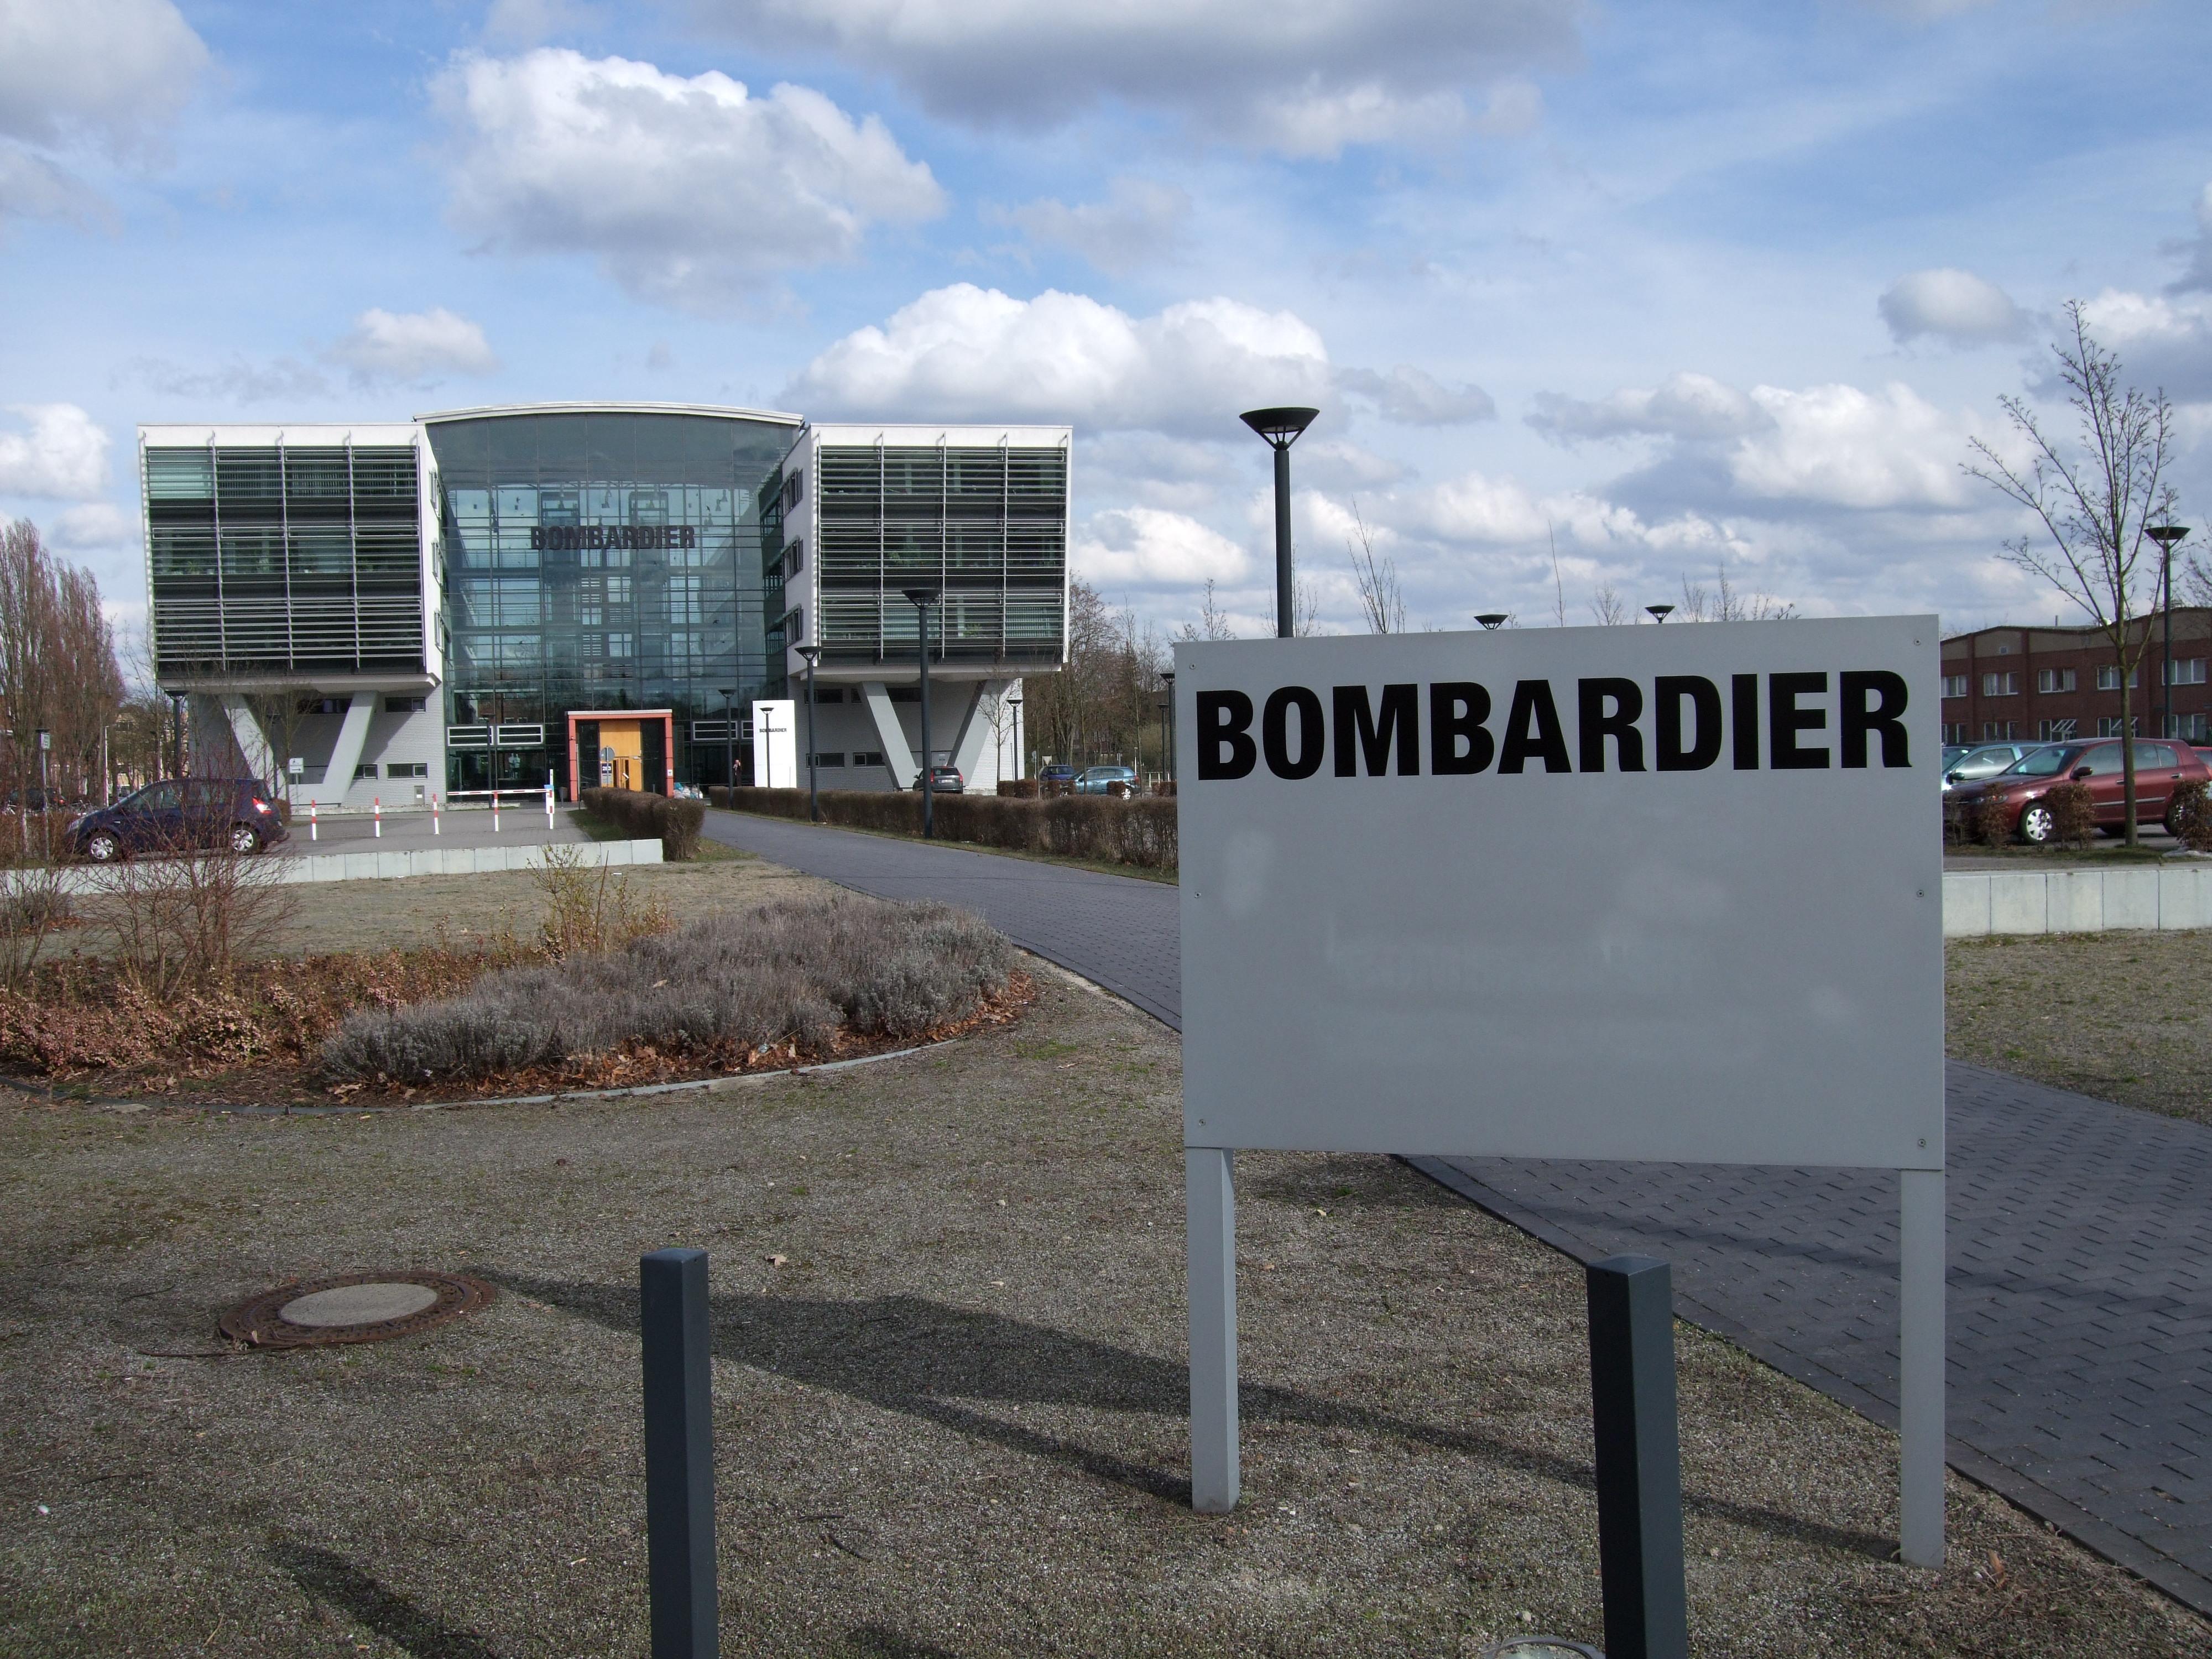 Hennigsdorf Germany  city pictures gallery : Bombardier Hennigsdorf Hennigsdorf, Germany